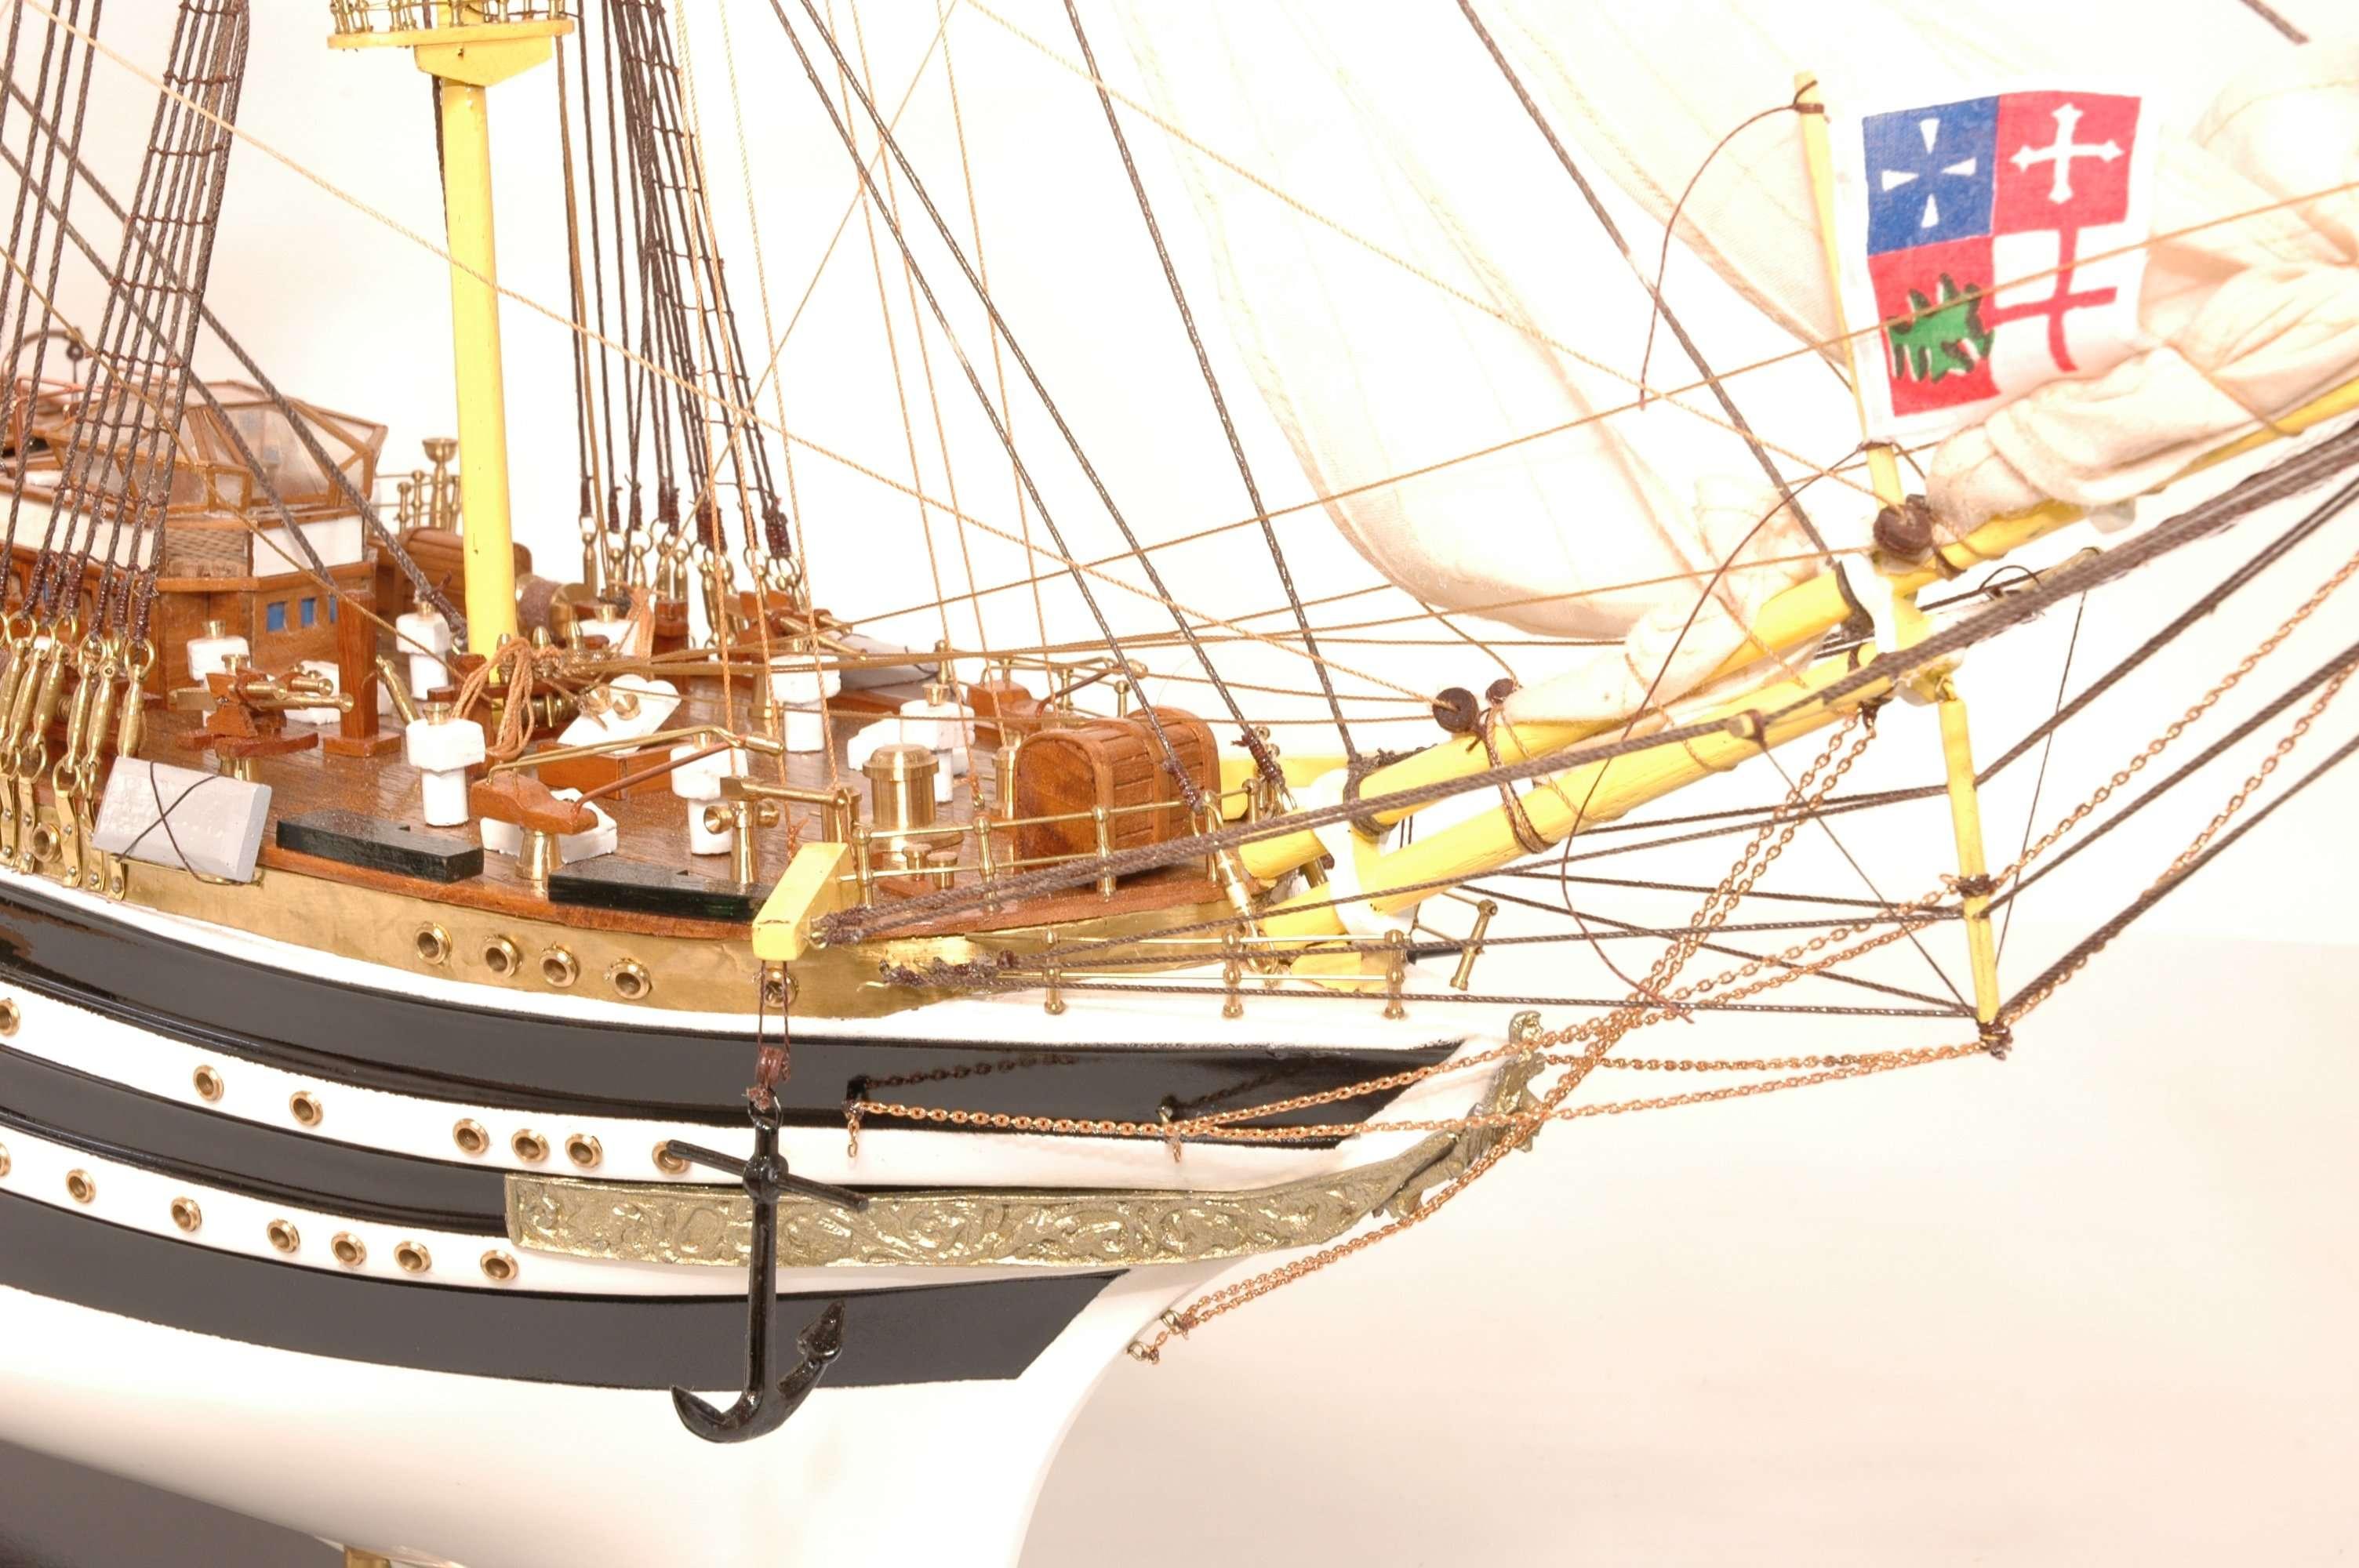 498-4217-Amerigo-Vespucci-Model-Ship-Superior-Range